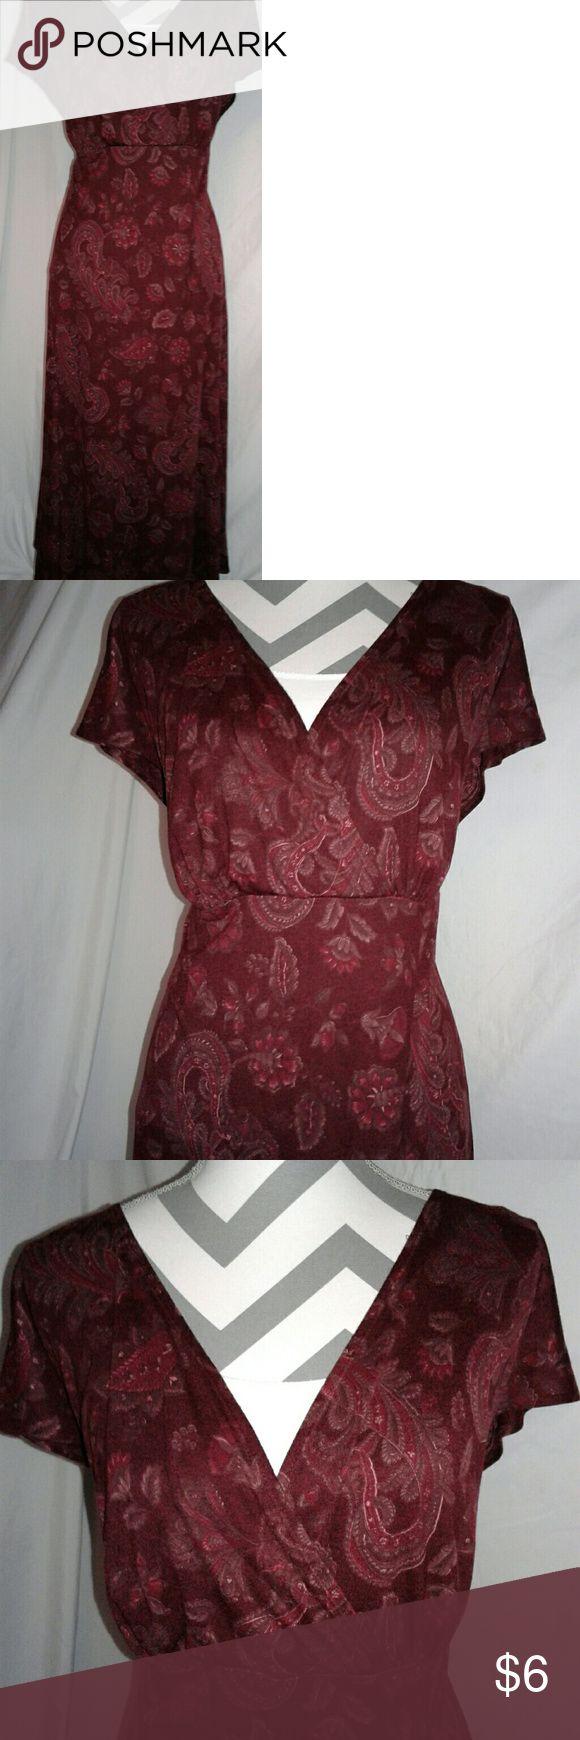 SCARLETT DRESS - SIZE 20W EXCELLENT CONDITION   SIZE 20W Dresses